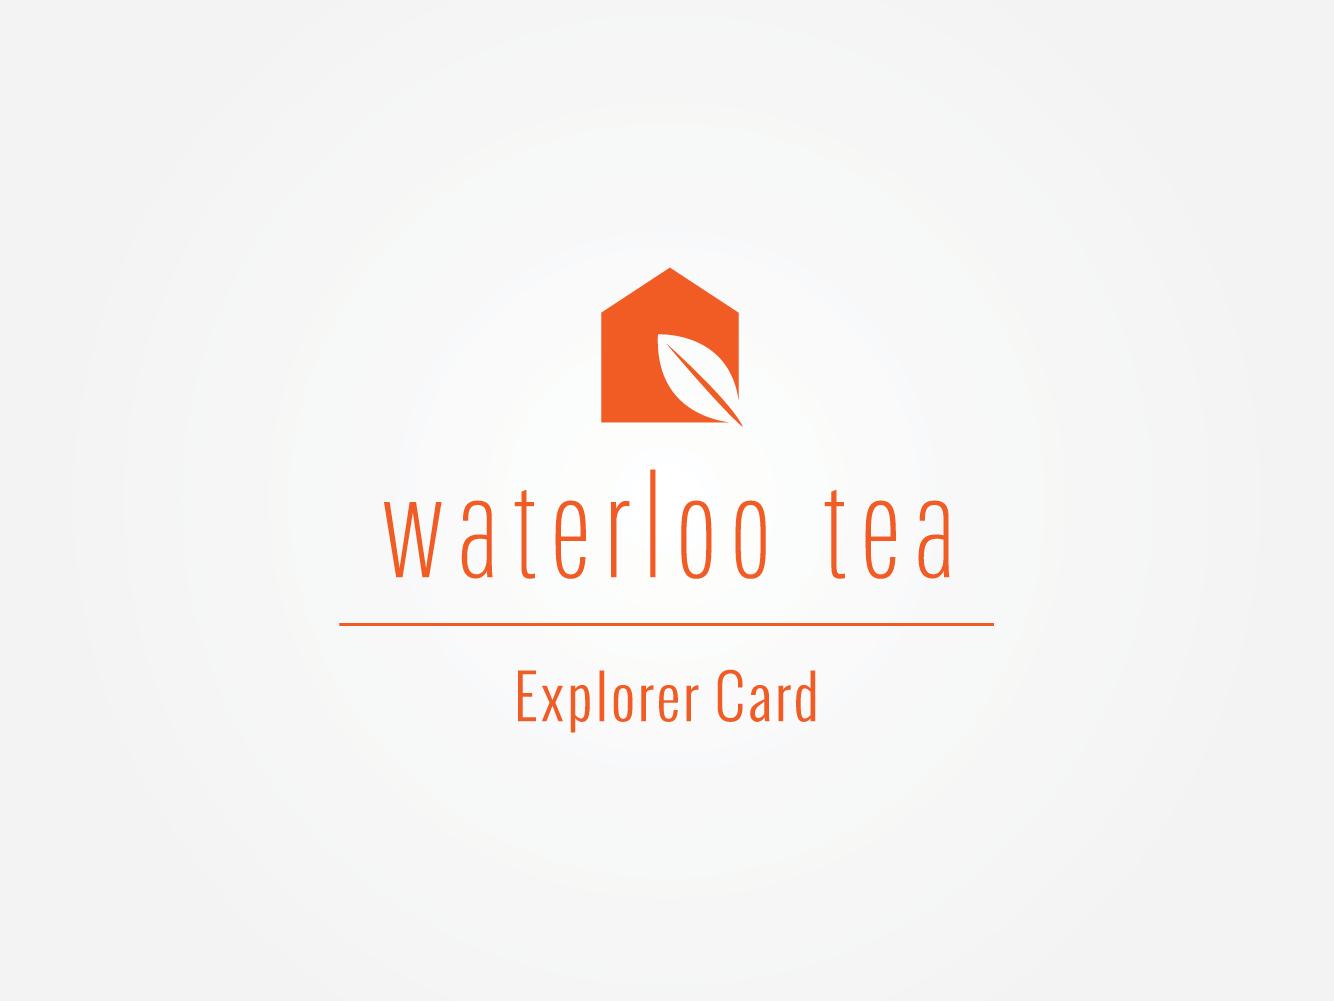 Waterloo Tea Cardiff upscale cafe loyalty card design